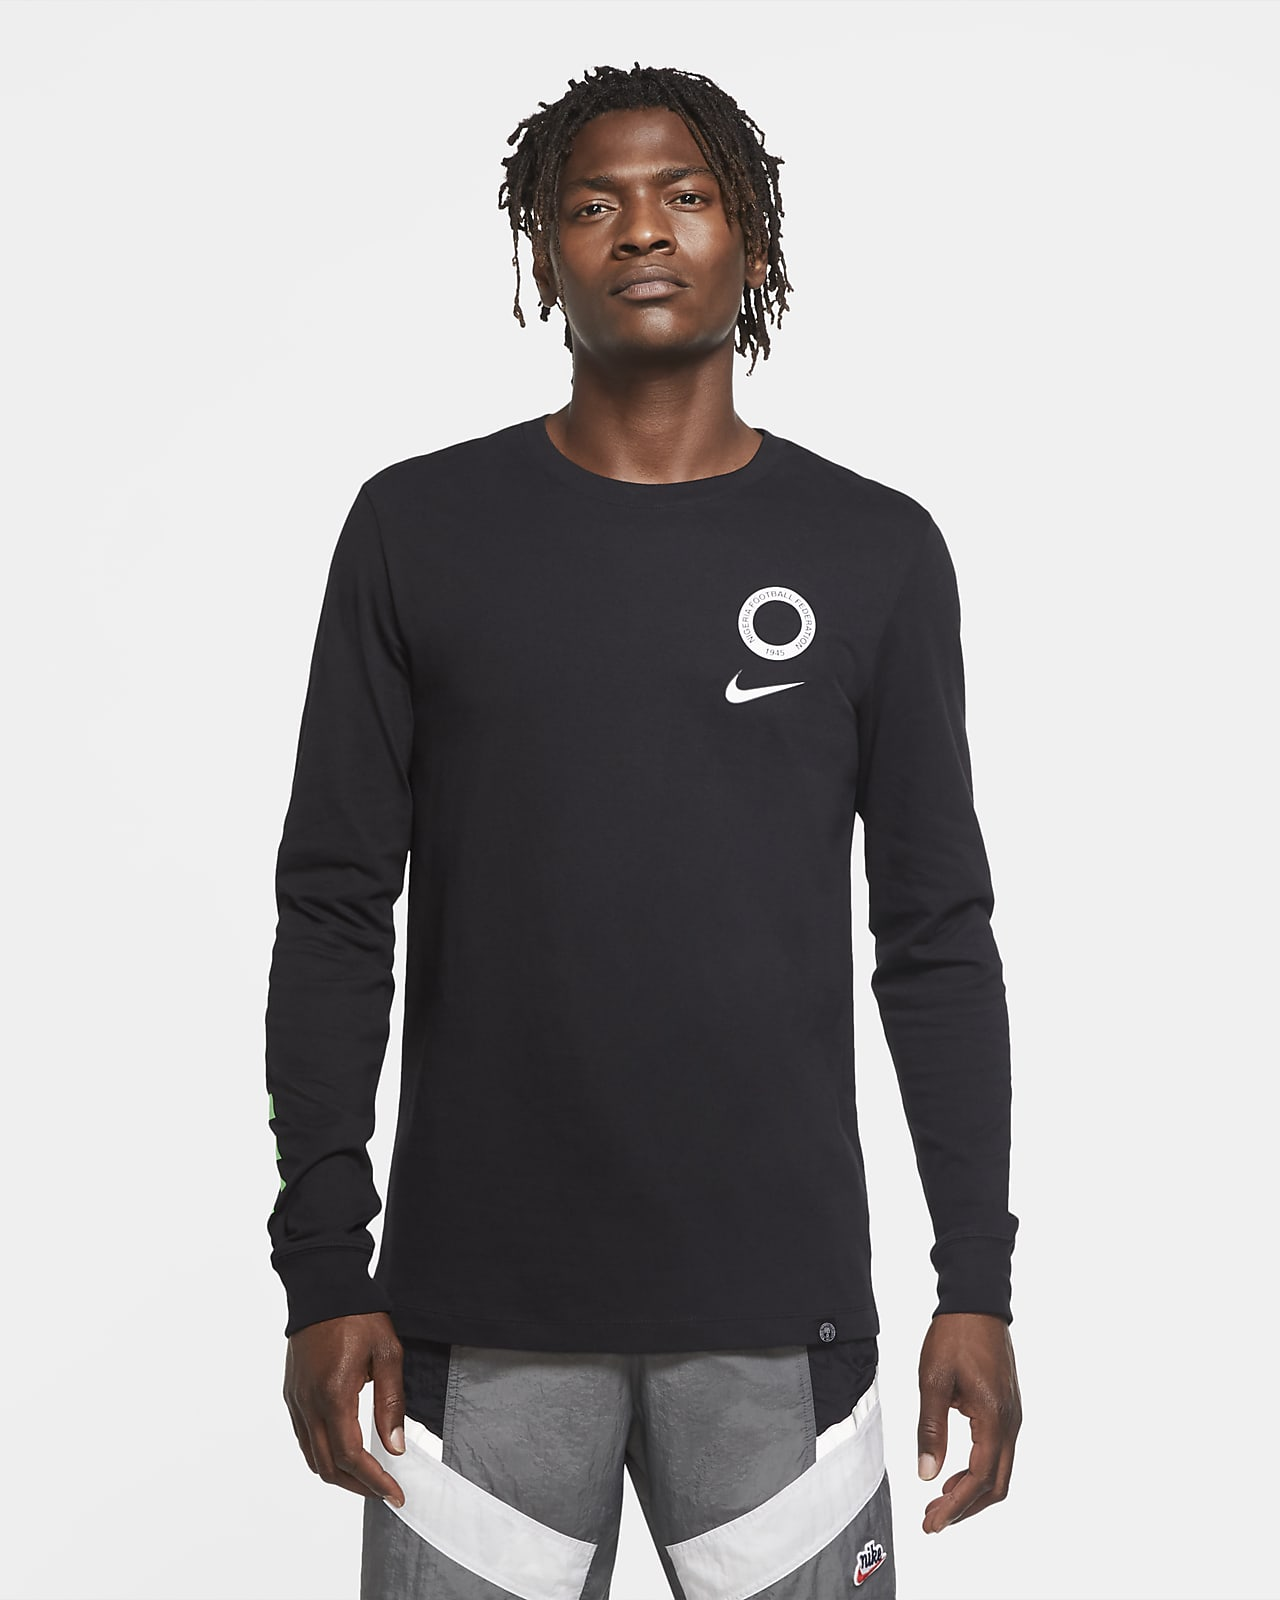 Nigeria Men's Long-Sleeve Soccer T-Shirt